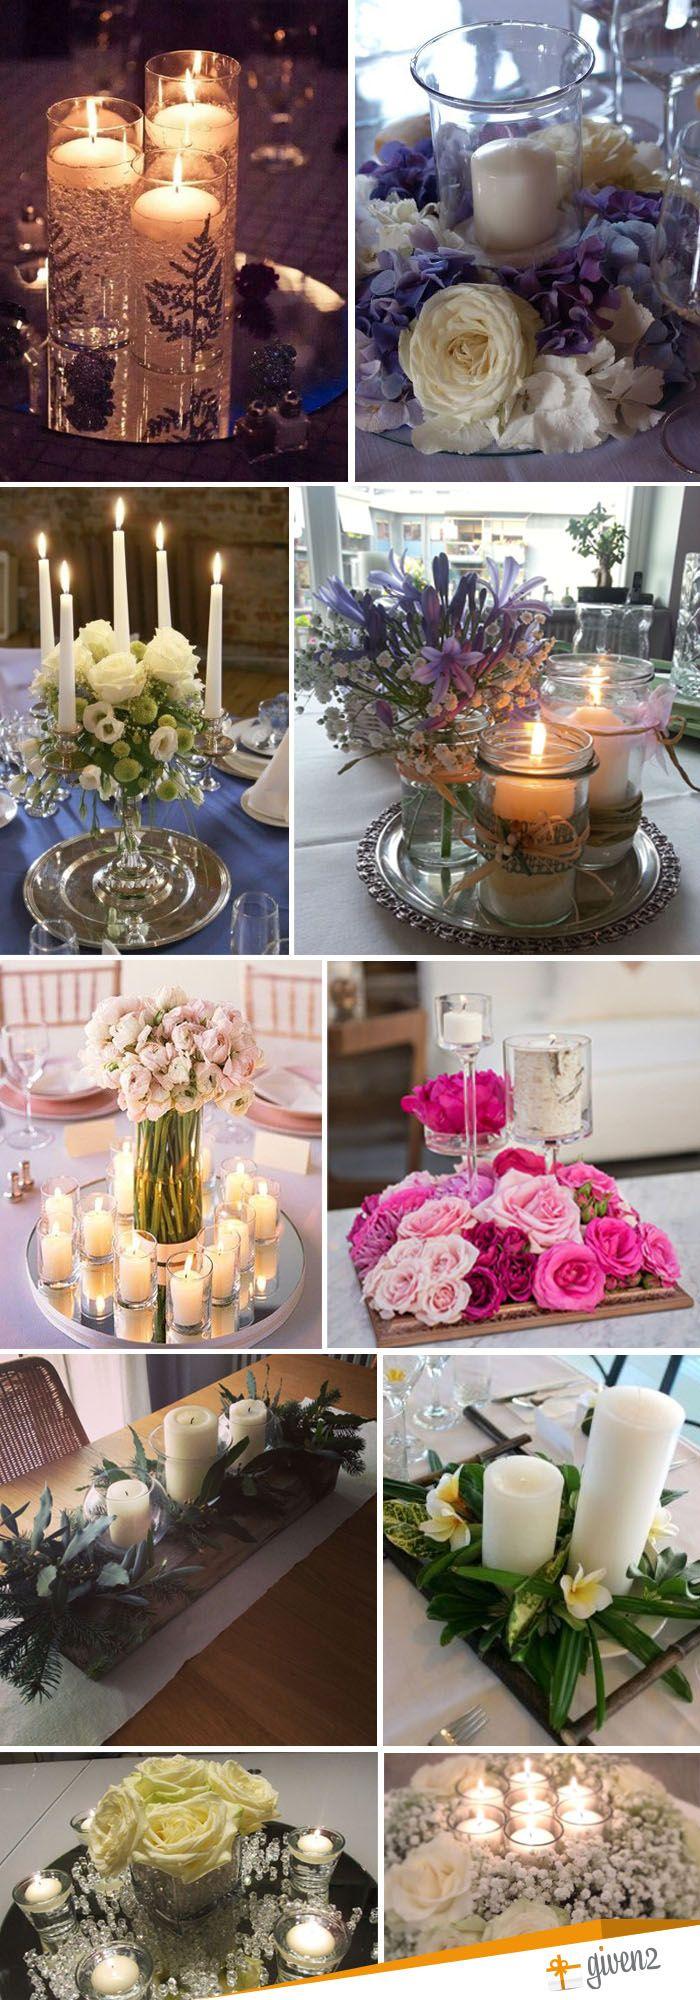 Centro tavola matrimonio con candele